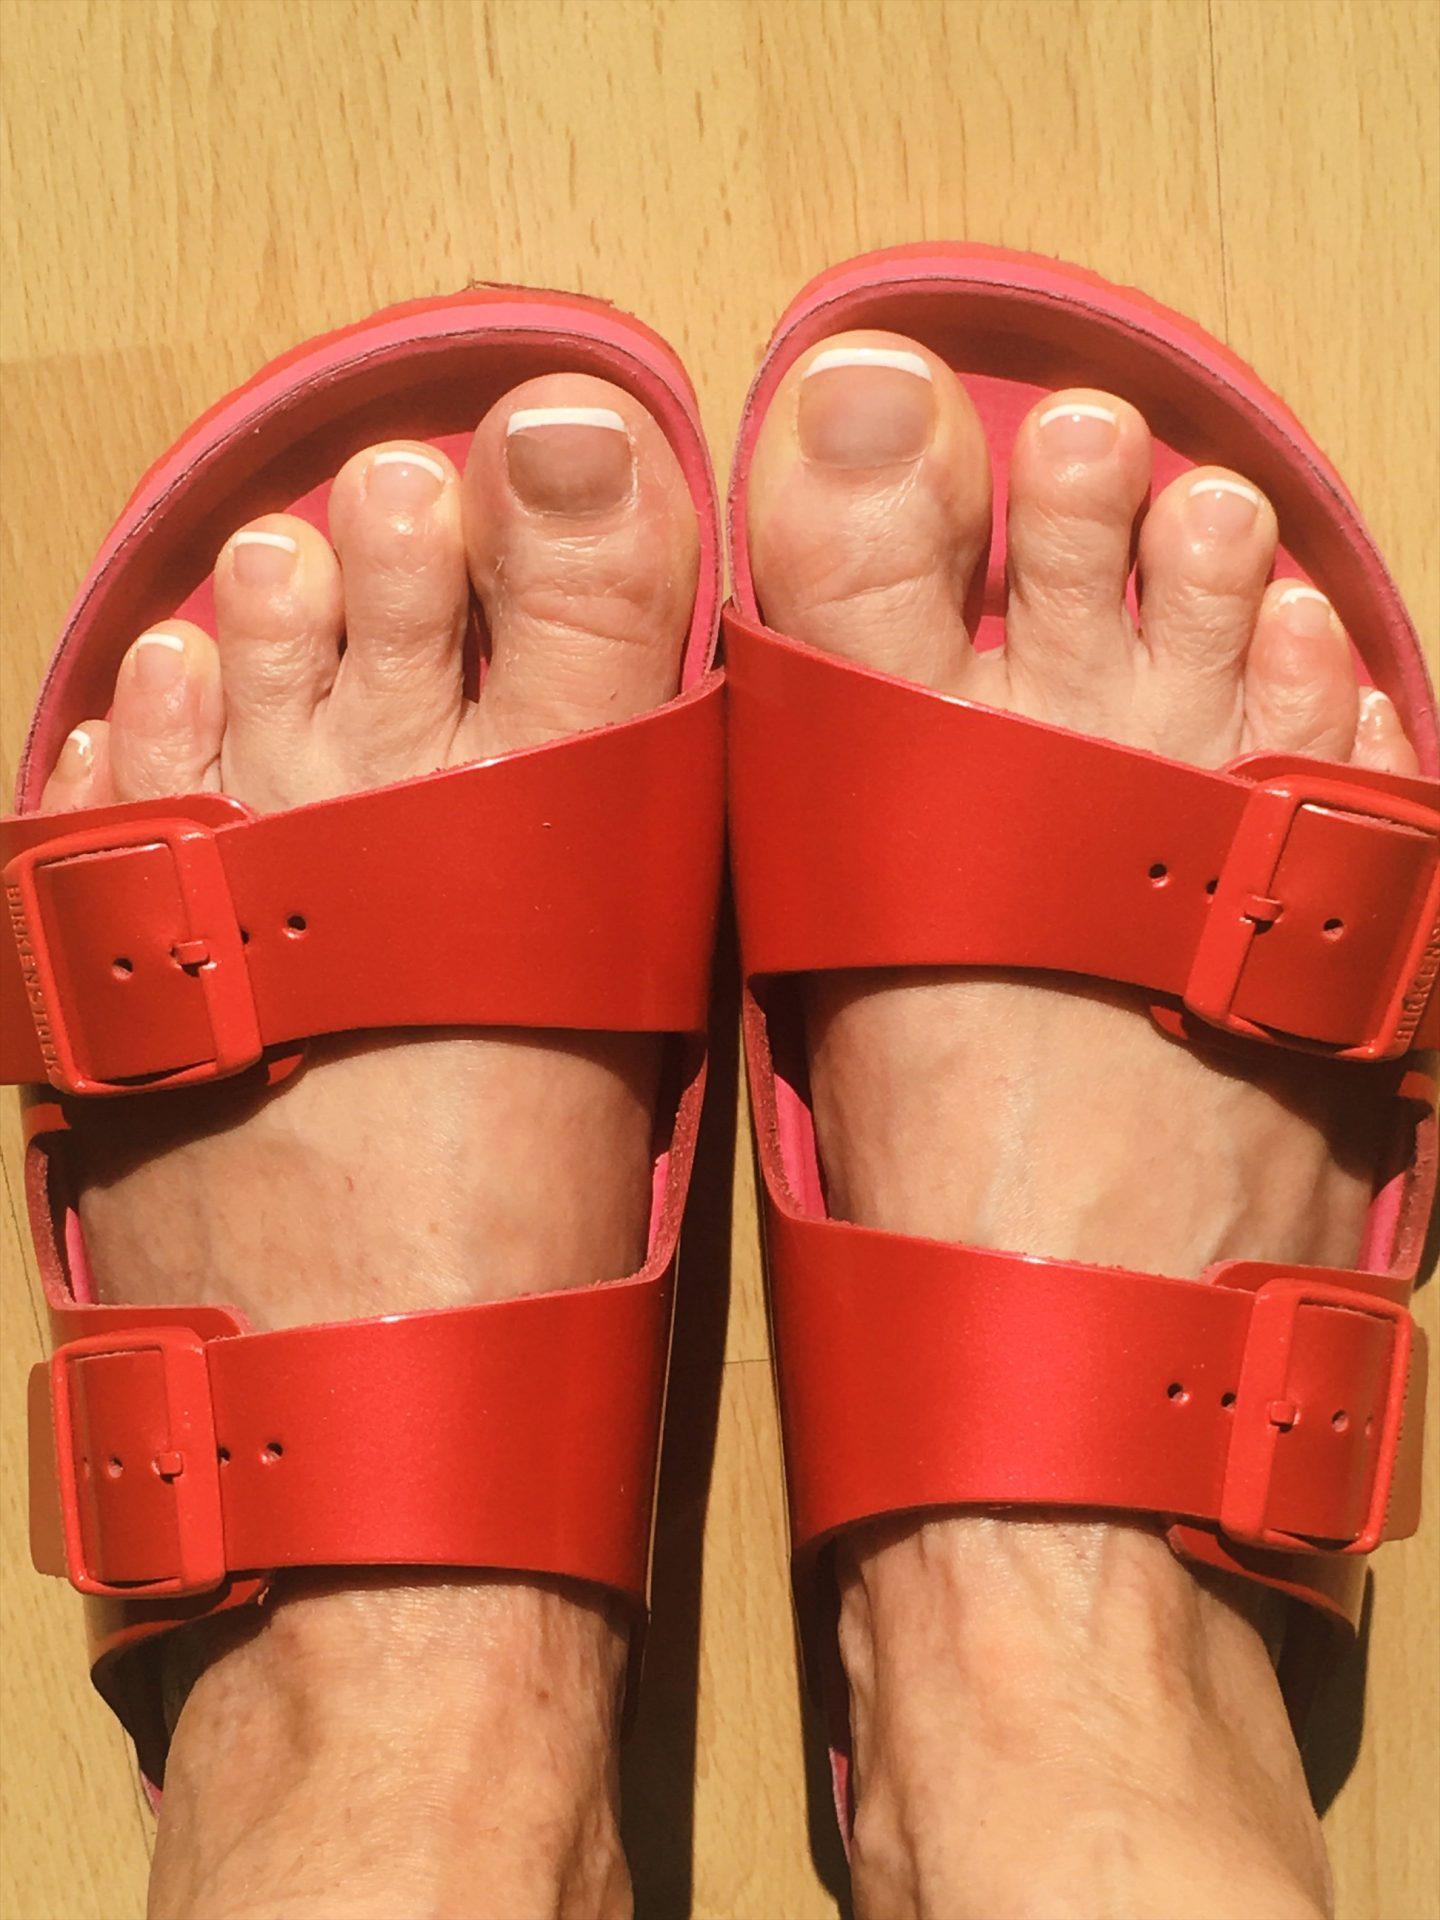 glamupyourlifestyle birkenstock bequeme-schuhe schuhe sneakers ue-40-mode ü40-blog fashionblogger